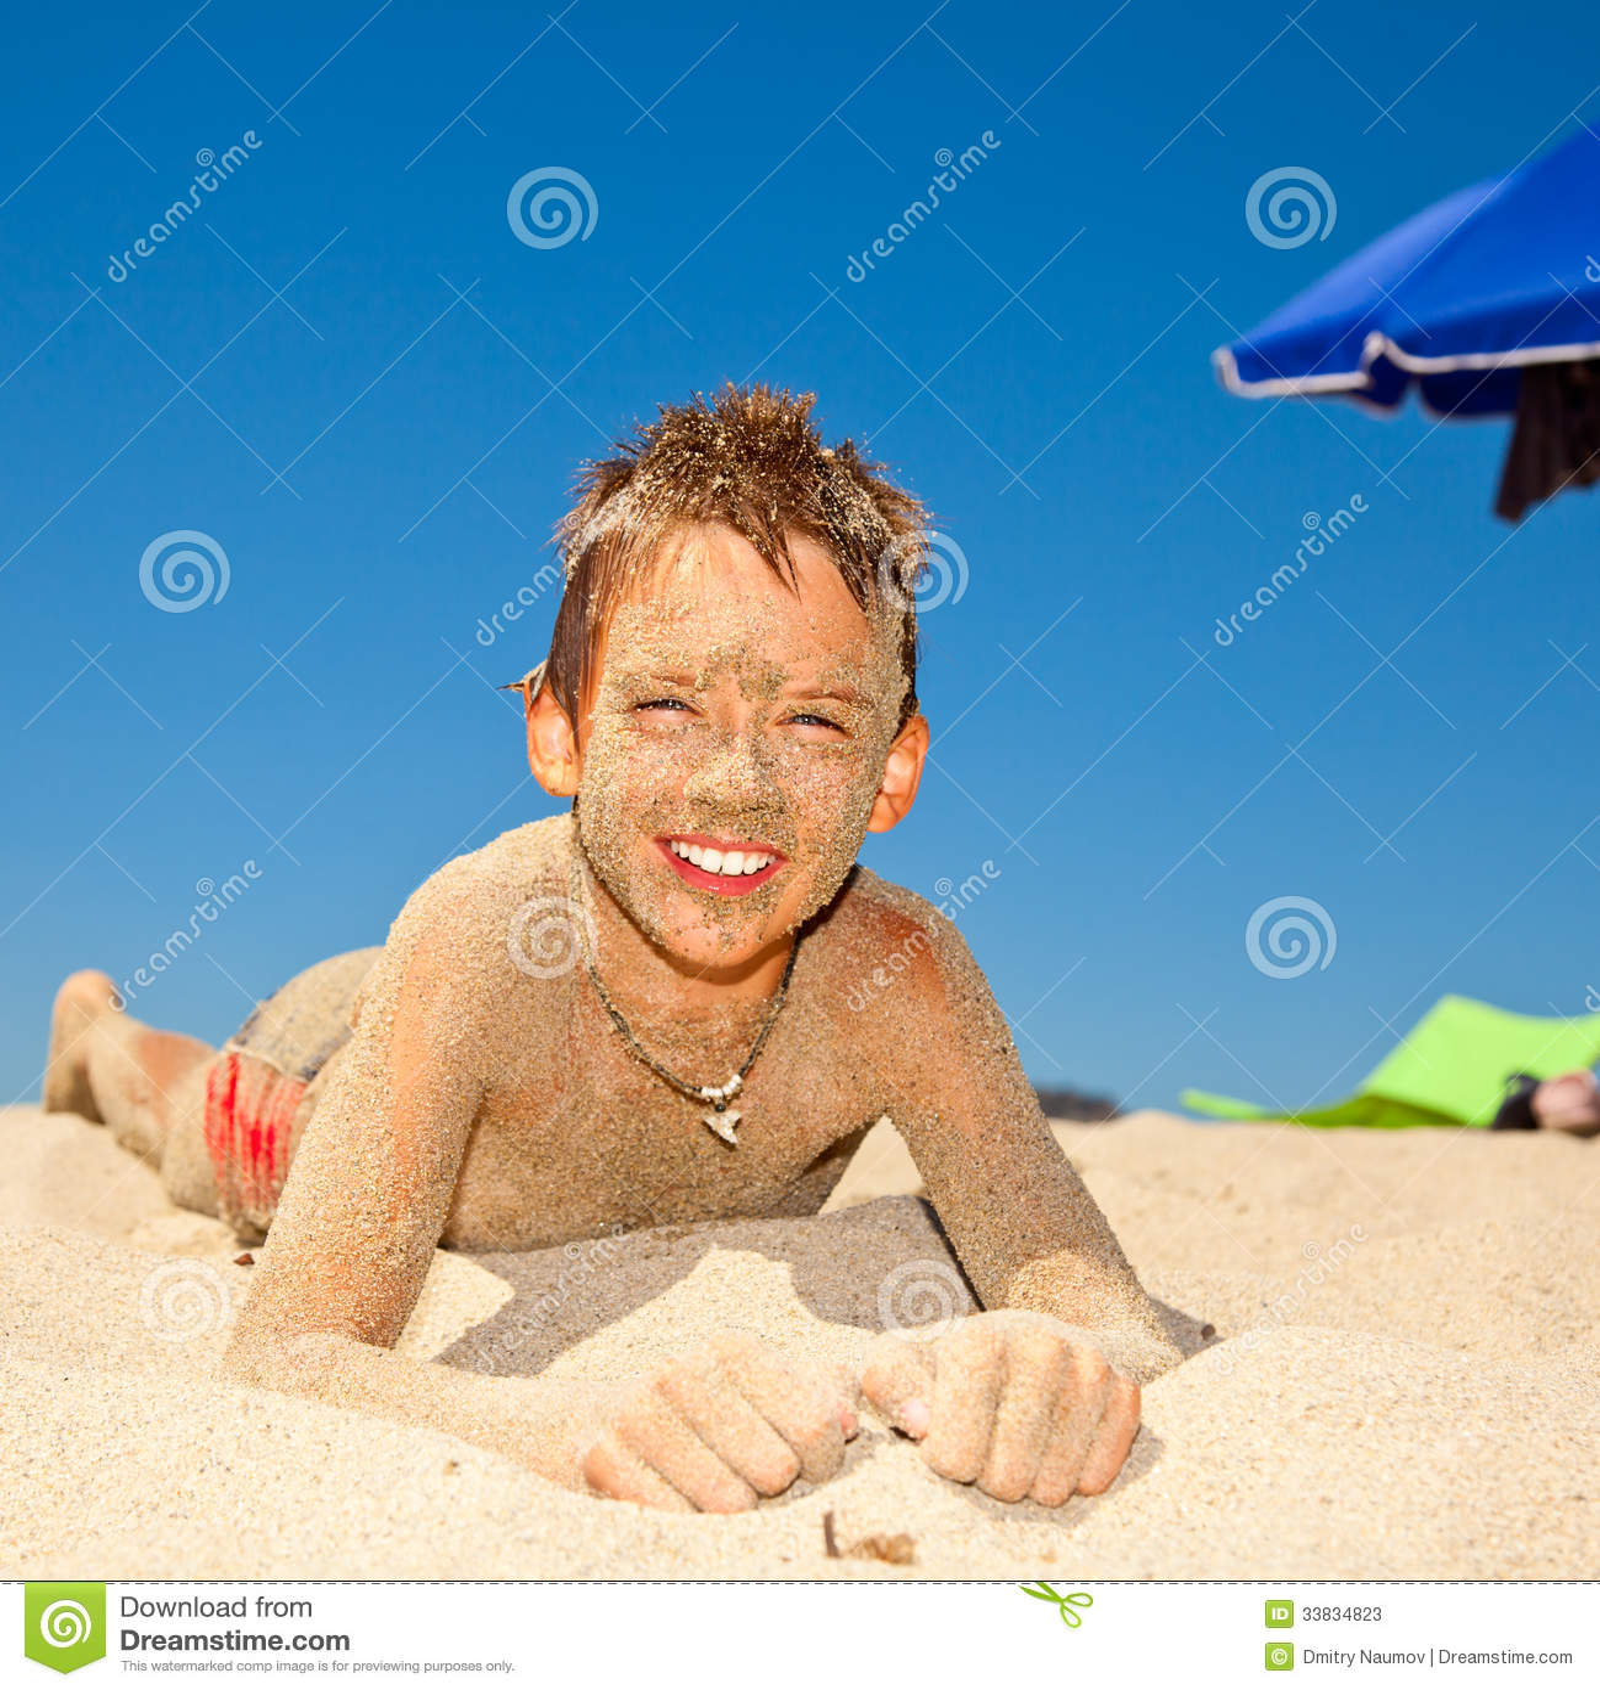 Sandy Boy On A Beach Stock Image. Image Of Lifestyle